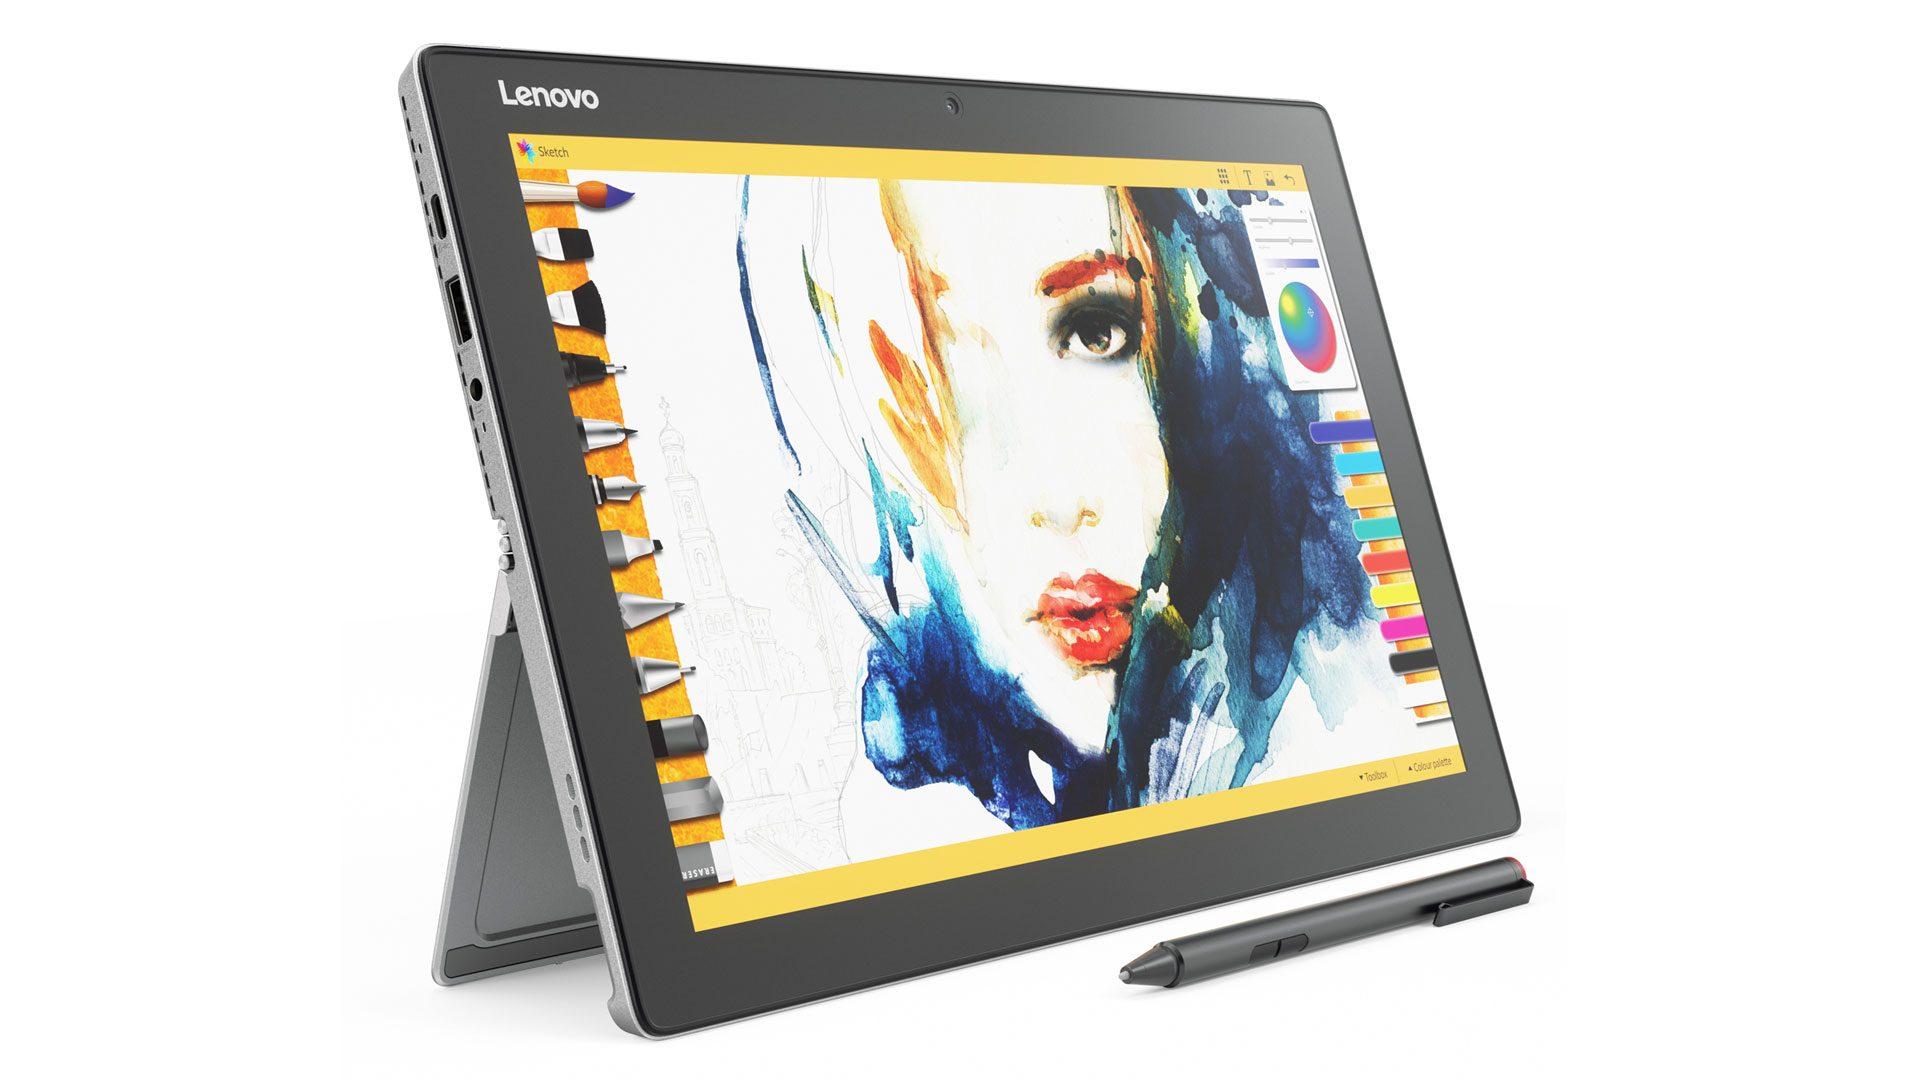 Lenovo-Ideapad-MIIX-510-12IKB_Ansicht-9